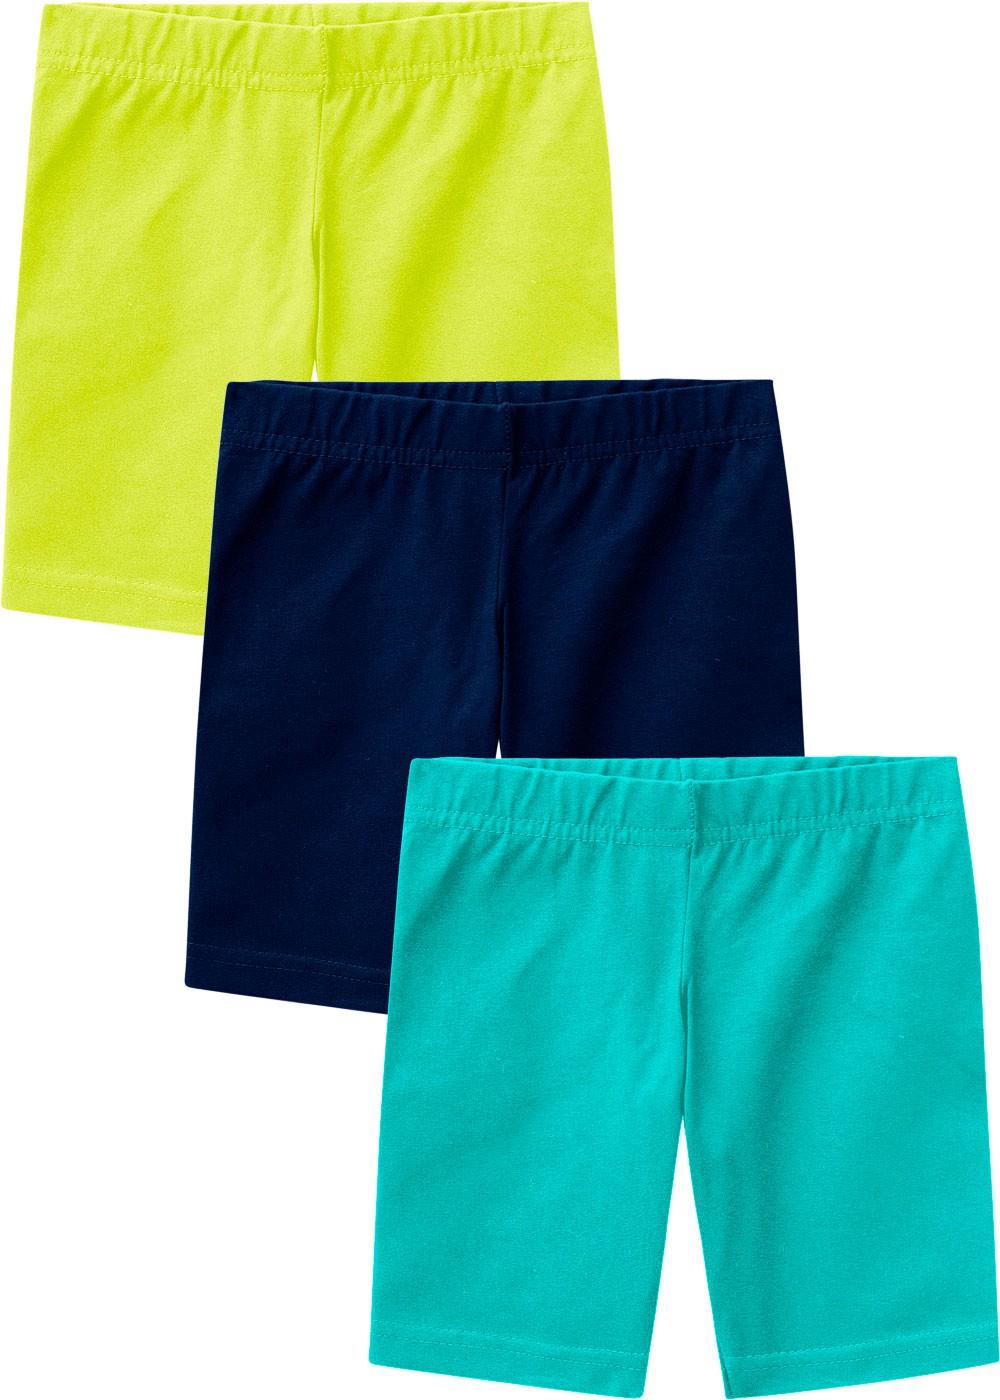 Bermuda Ciclista Infantil Feminina Kit 3 Verão Colors Malwee